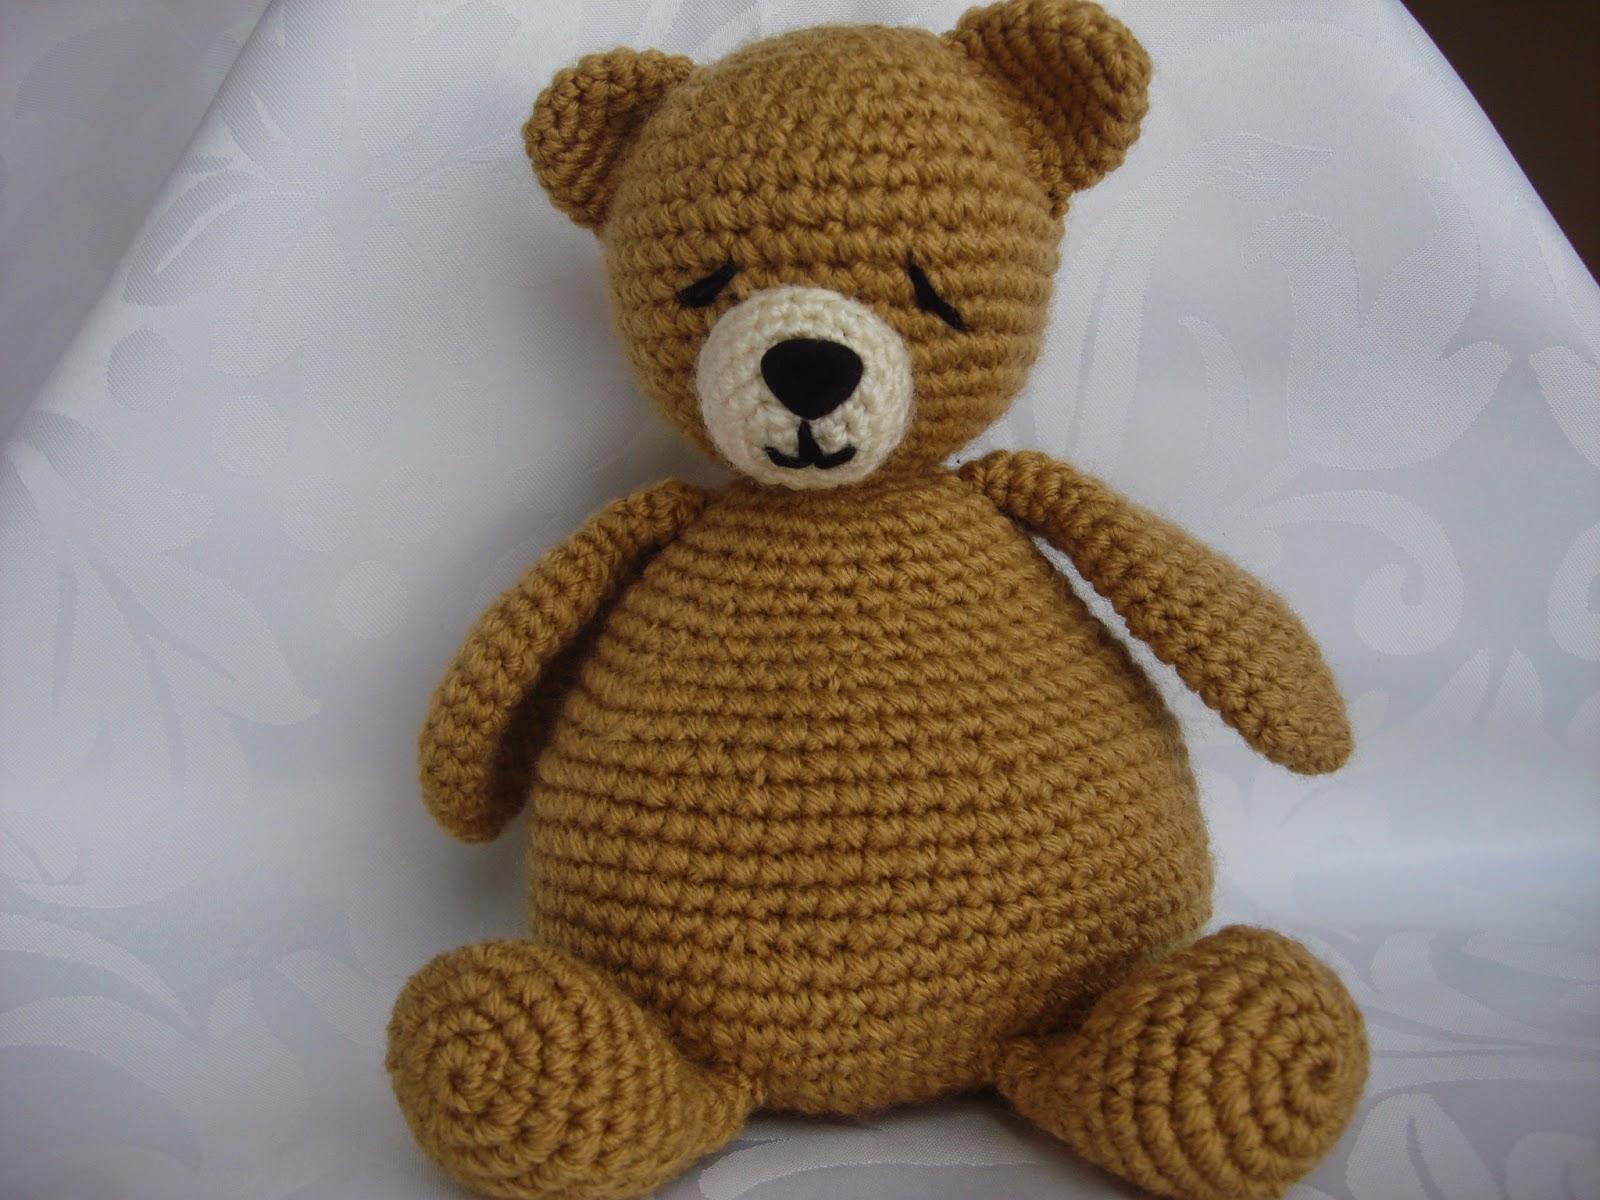 Osito Amigurumi Tutorial Canal Crochet : CANAL CROCHET: osito amigurumi